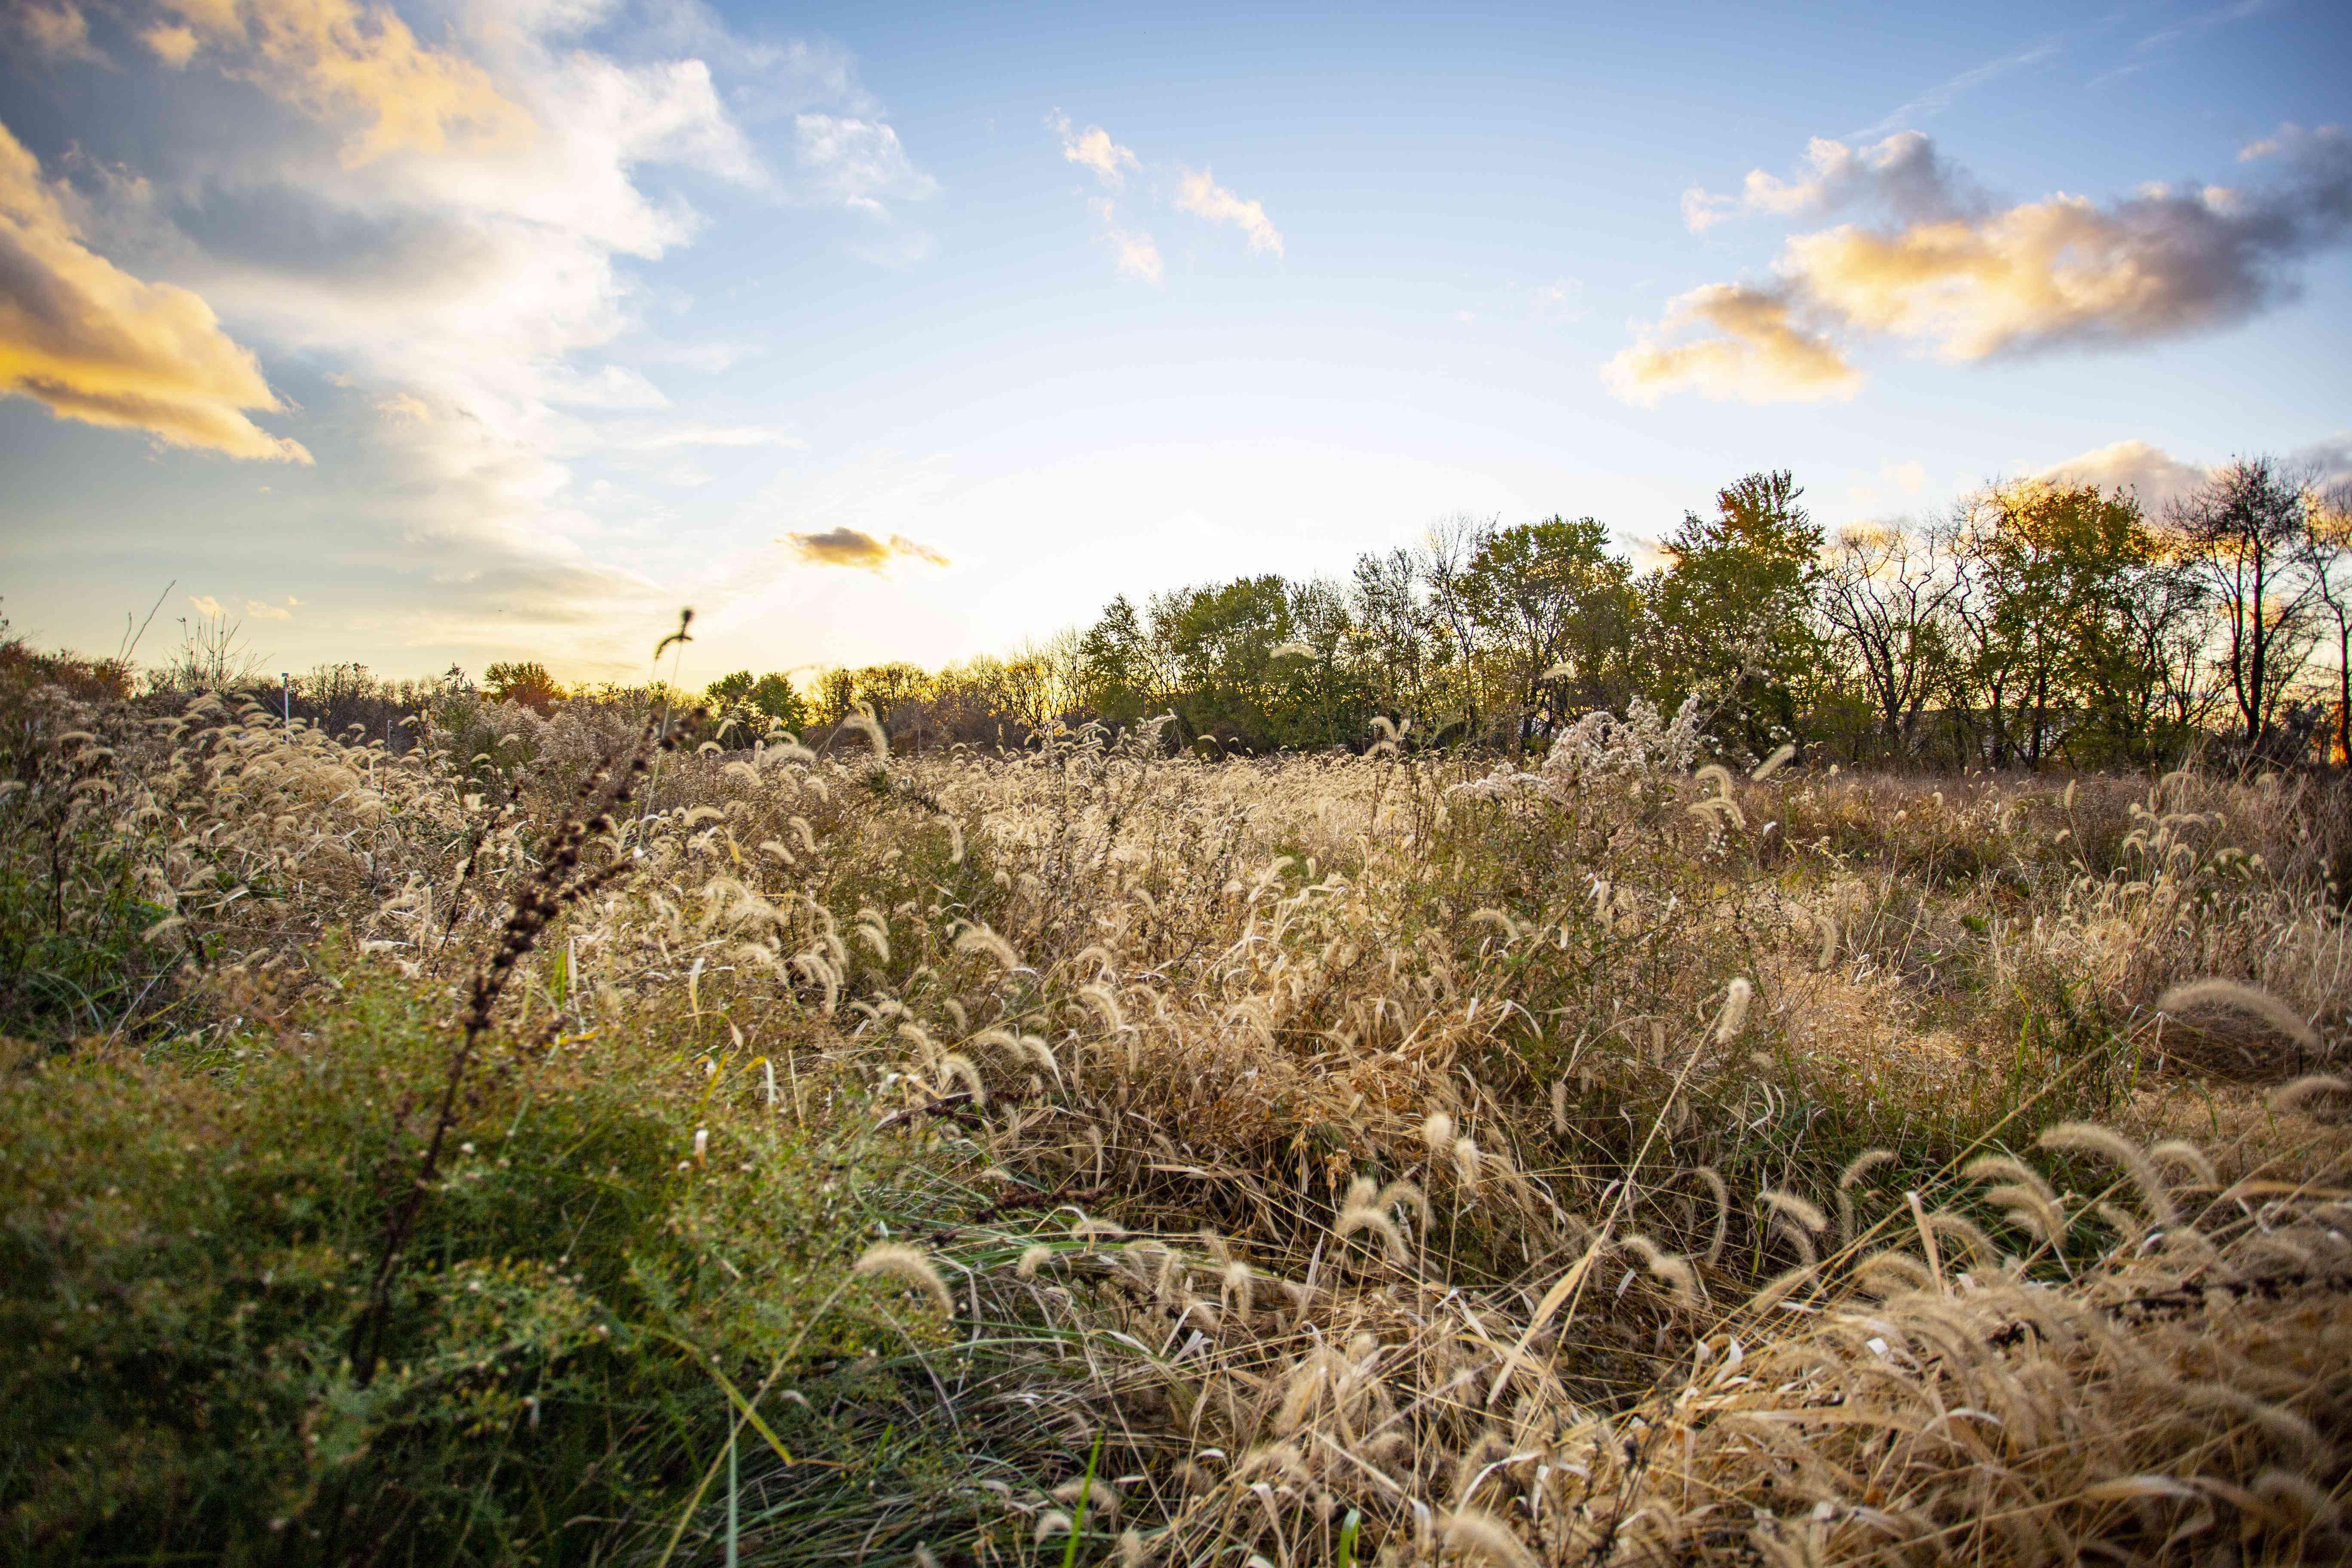 A grassy field during sunset in John Heinz National Park